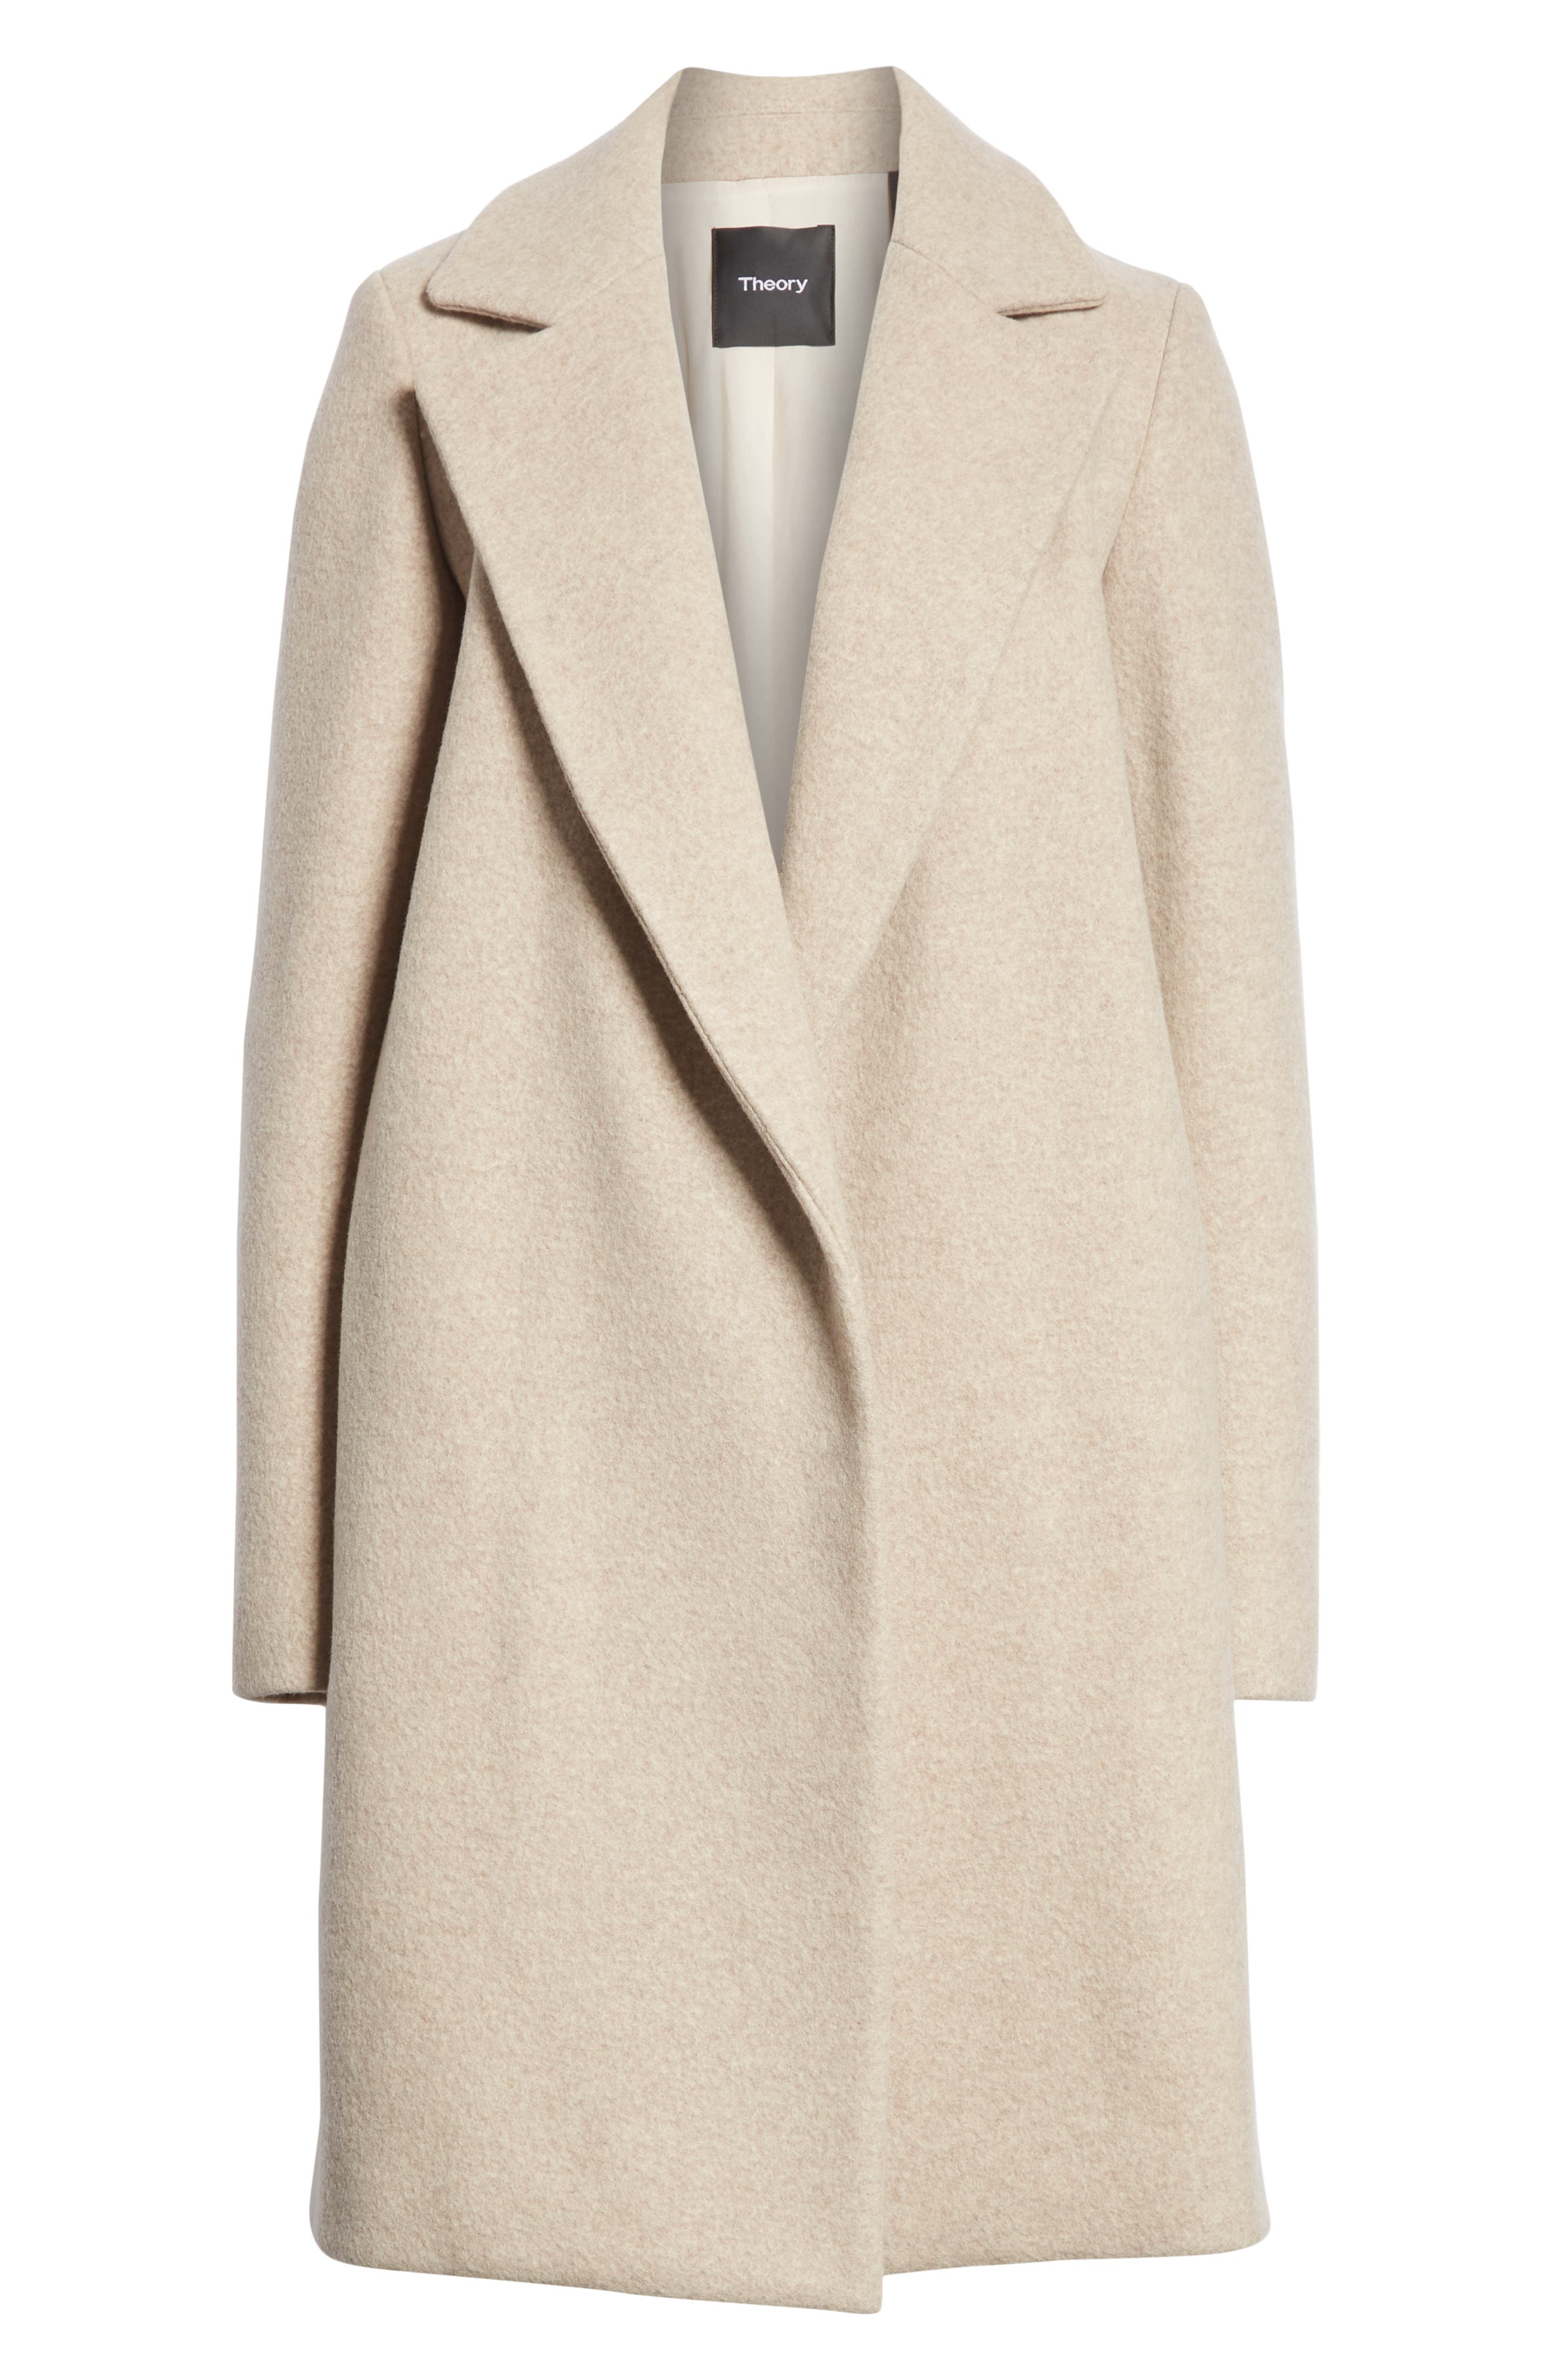 Clairene Hawthorne Wool Cashmere Coat,                             Alternate thumbnail 5, color,                             260